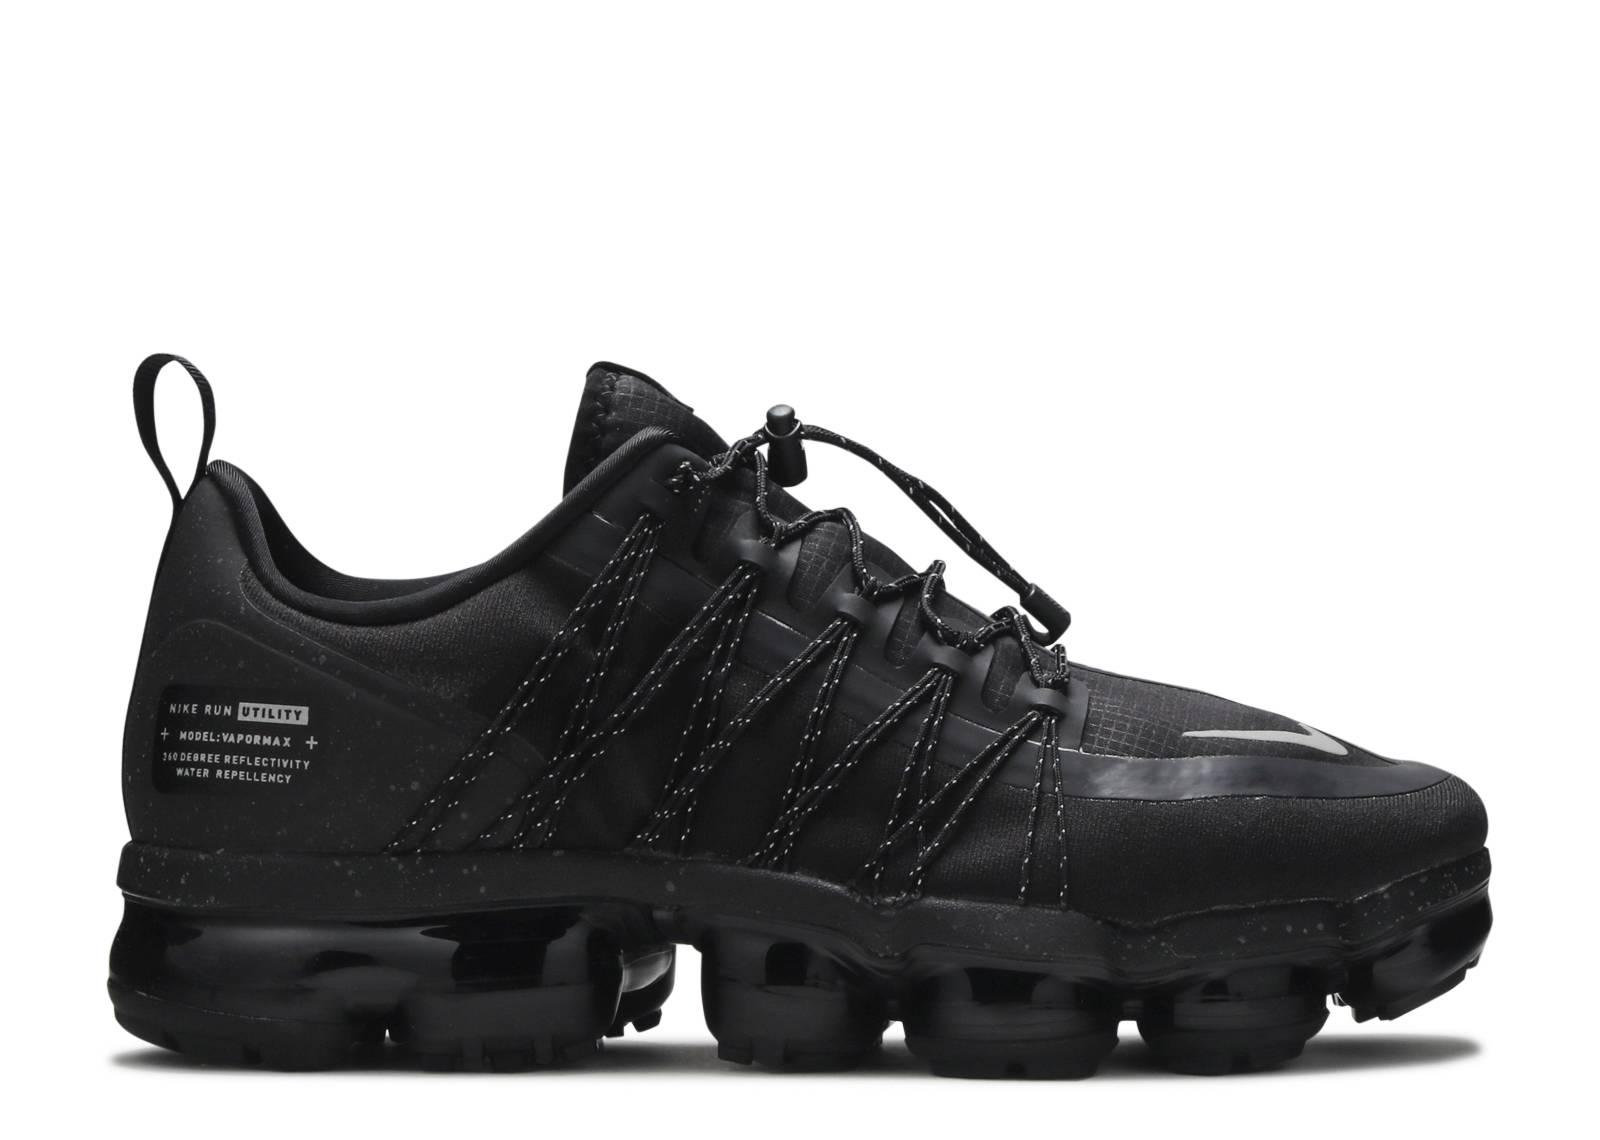 c27c6401aa Nike Air Vapormax Run Utility - Nike - aq8810 003 - black/reflect silver -  black   Flight Club